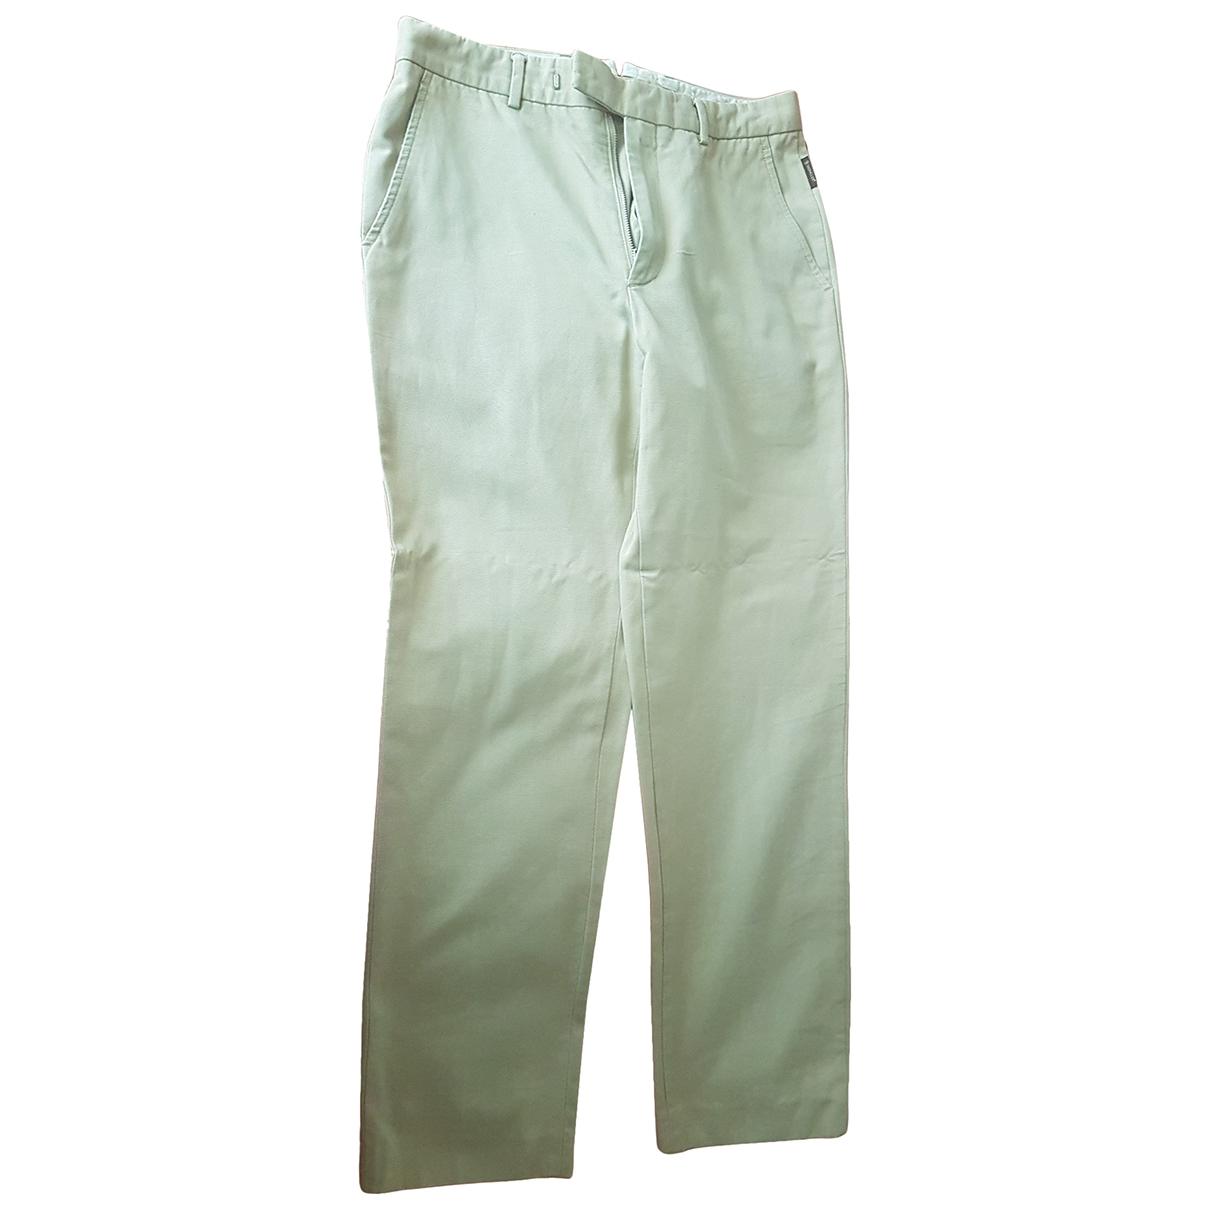 Pantalones en Algodon Beige Moncler